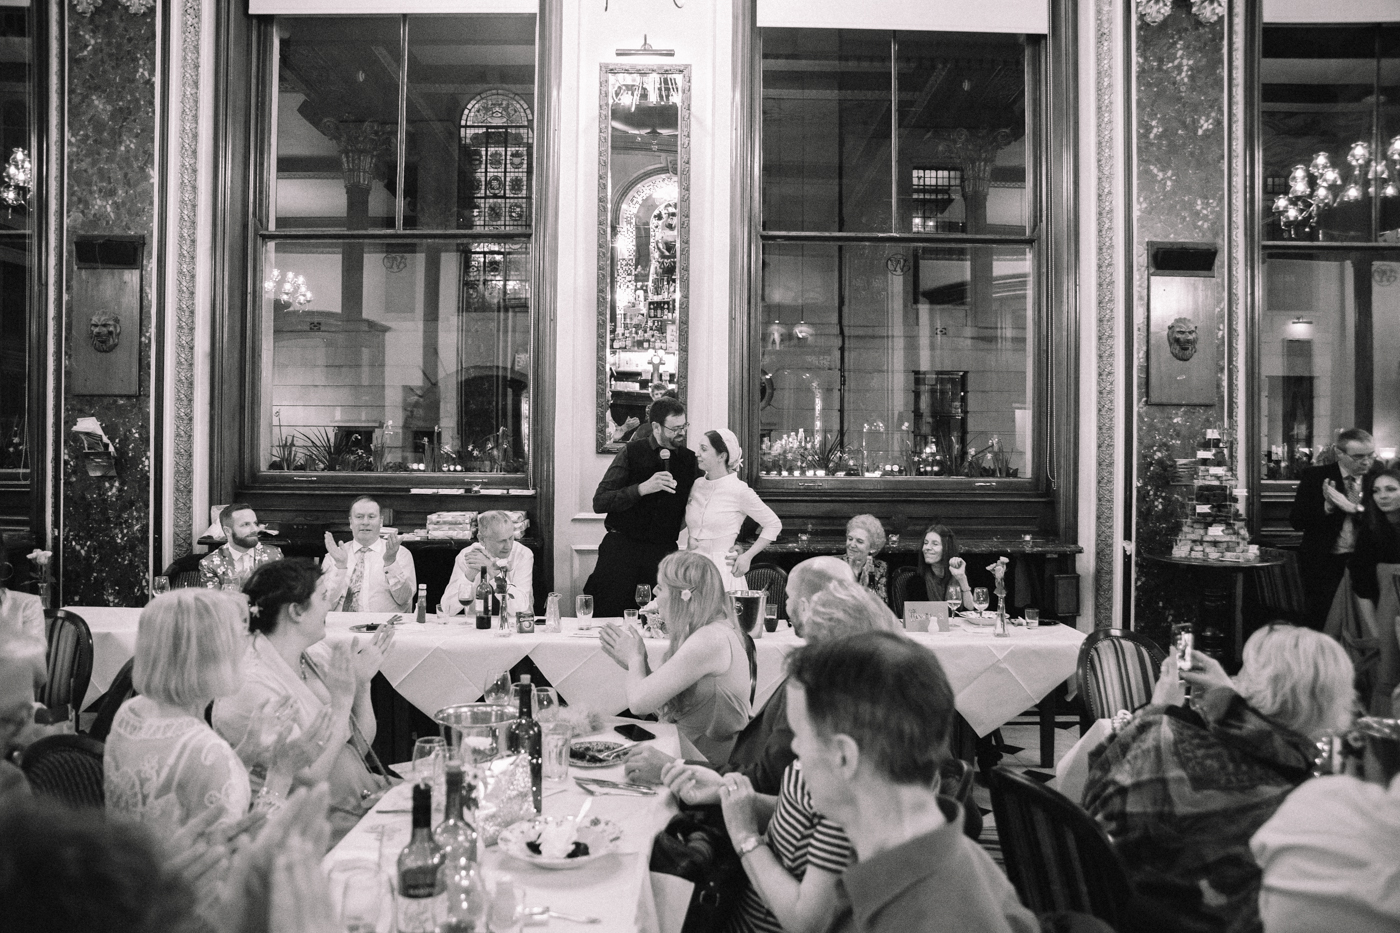 knights-templar-london-city-centre-wedding-photographer-charing-cross-creative-0033.jpg